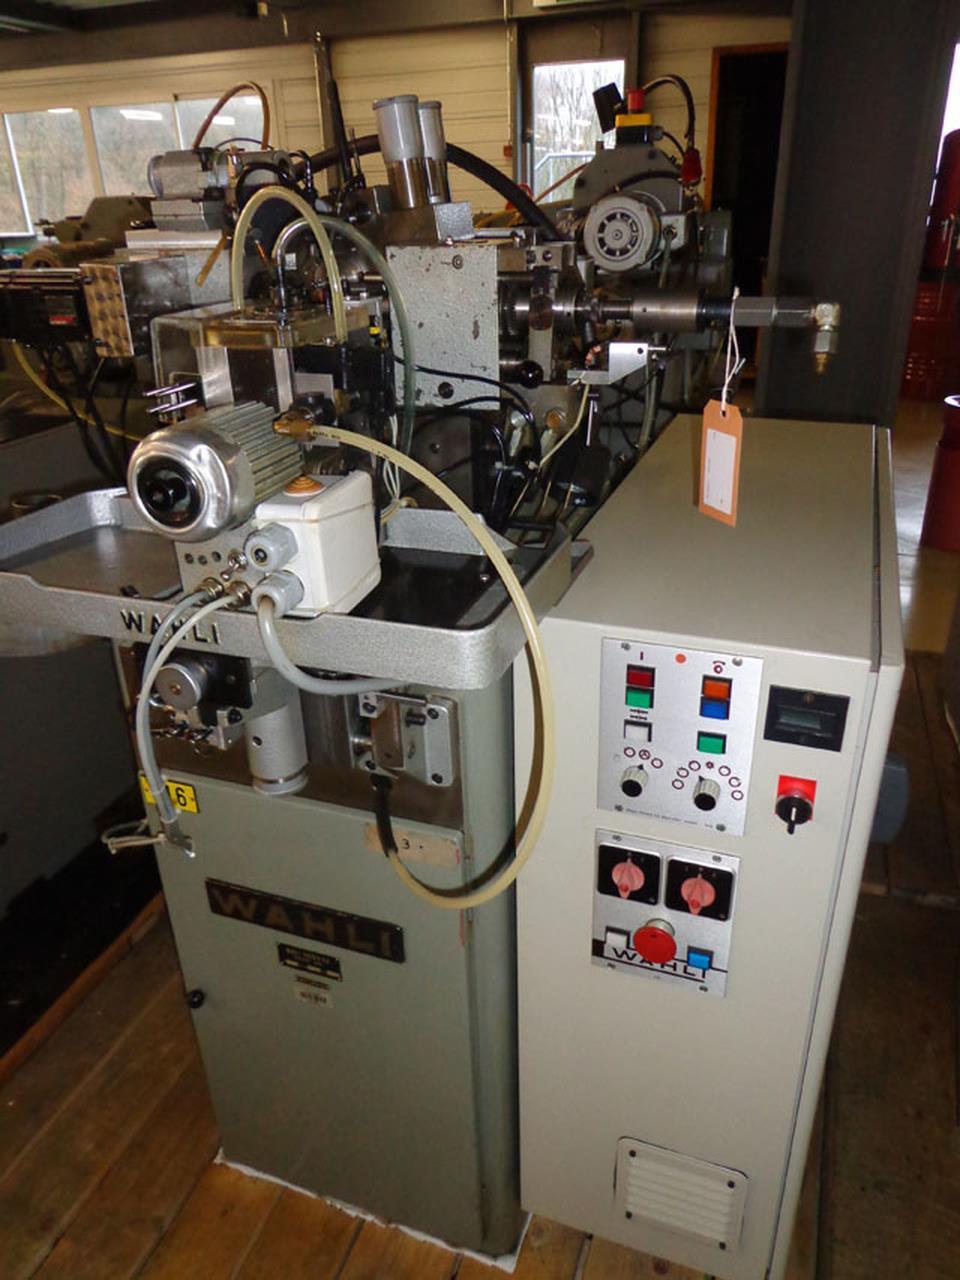 WAHLI W 92滚齿机二手的太旧海关允许进口采购吗?